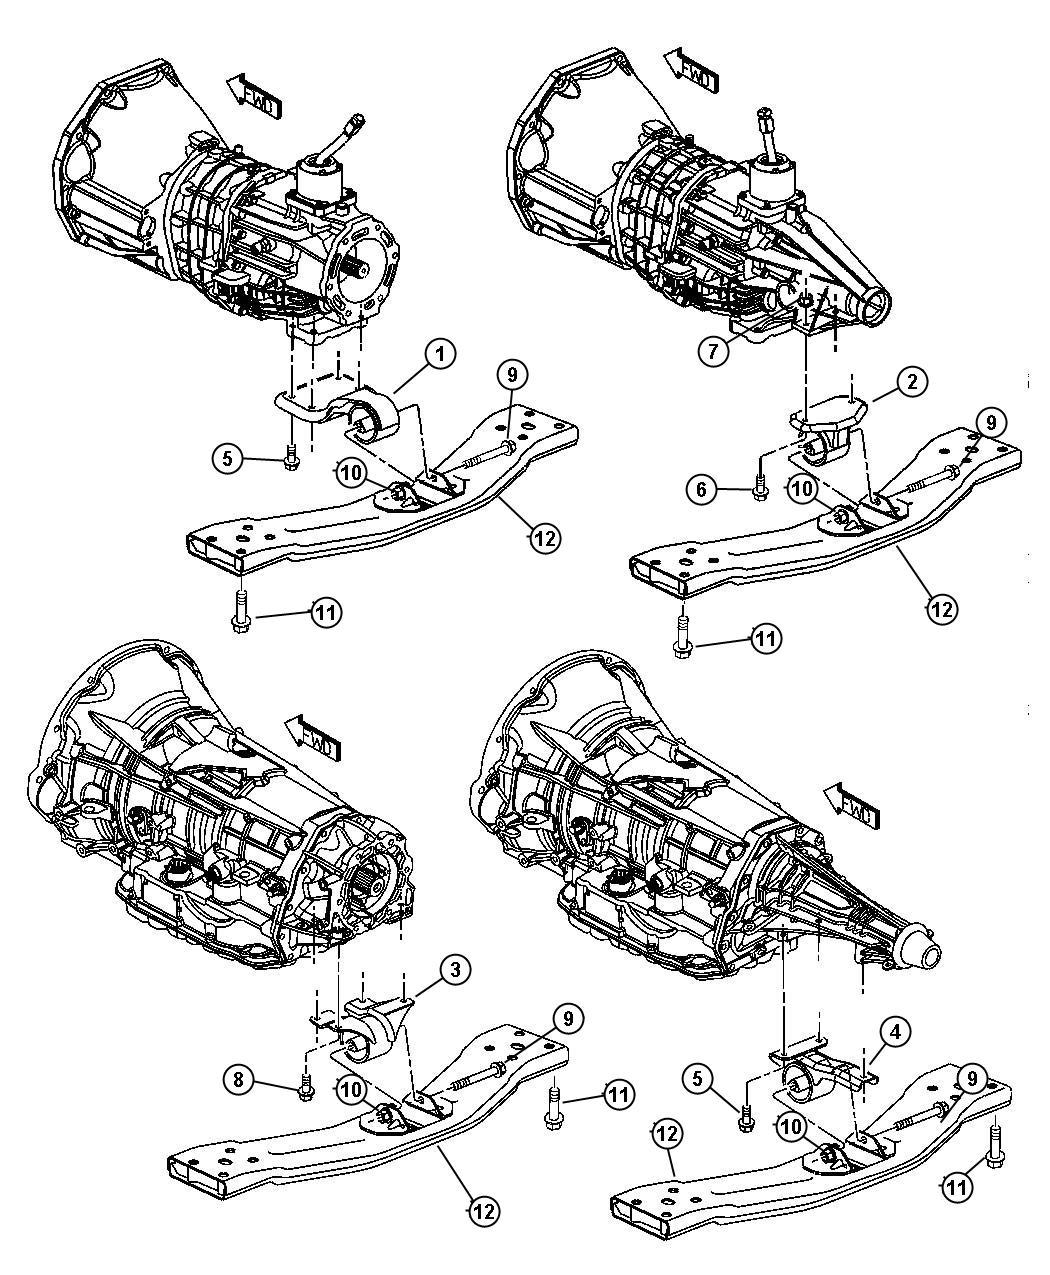 Jeep Liberty Mounting Engine Rear 3 7l 3 7l Power